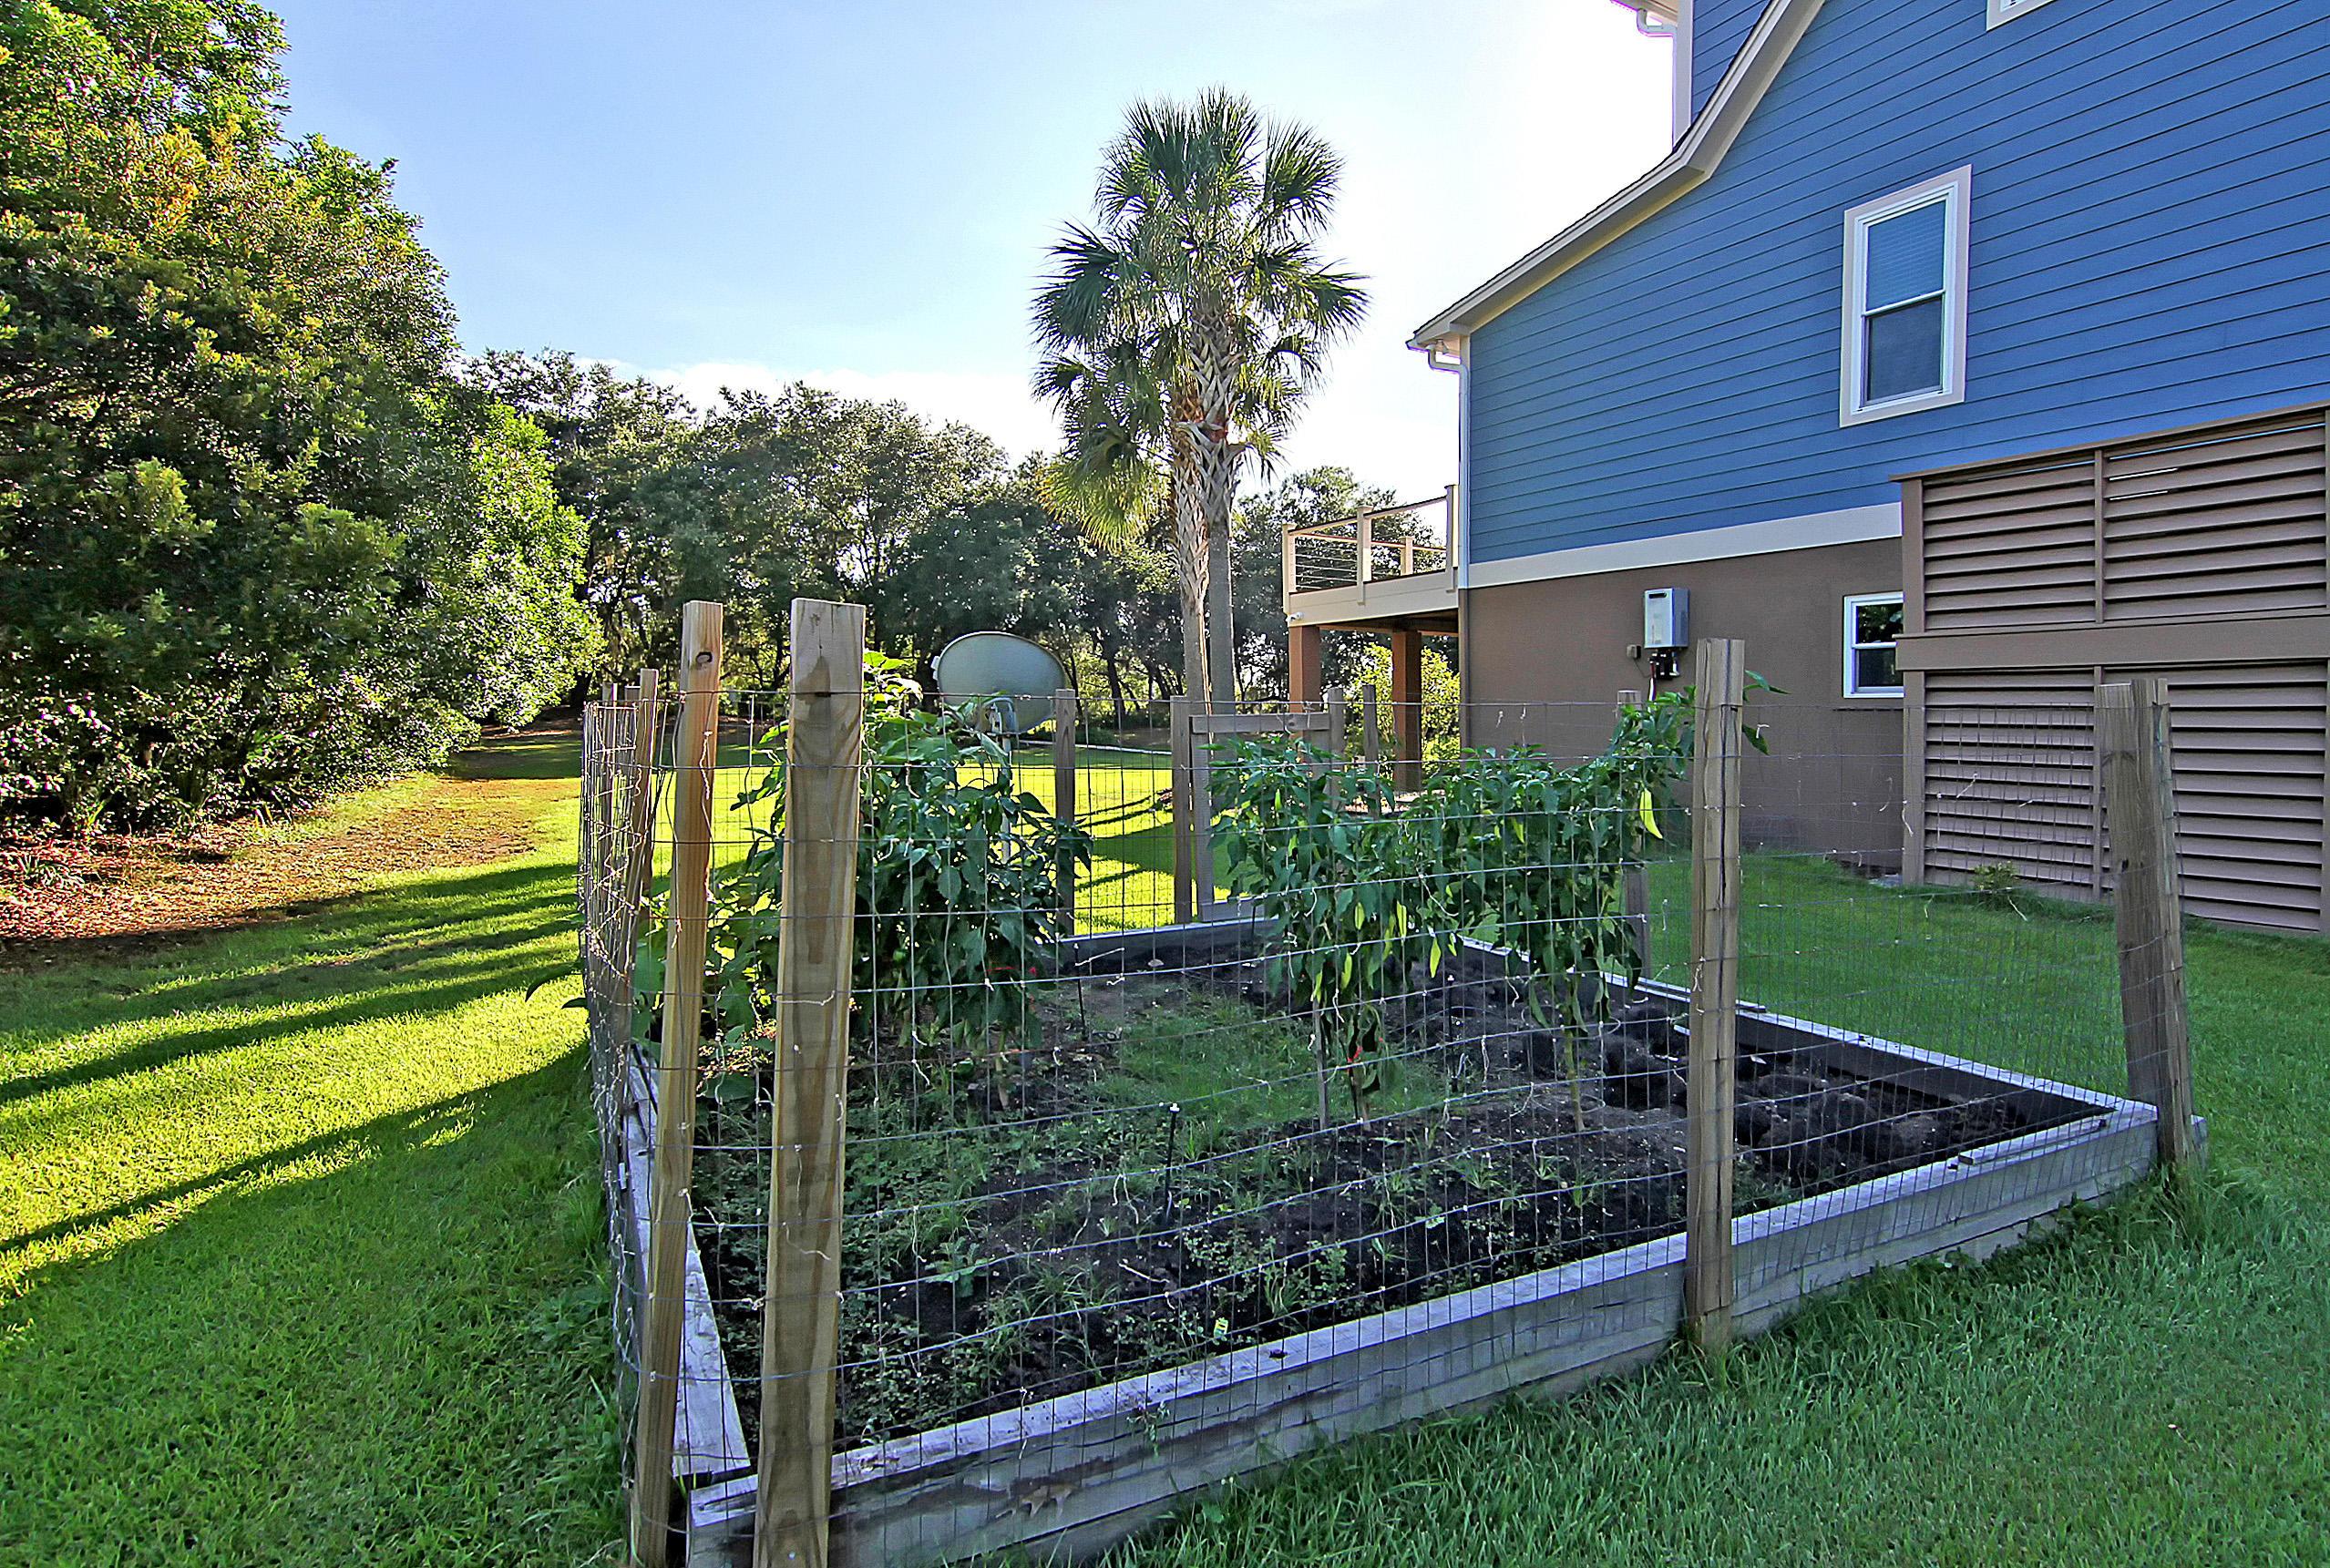 Archfield Plantation Homes For Sale - 4655 Archfield, Meggett, SC - 15